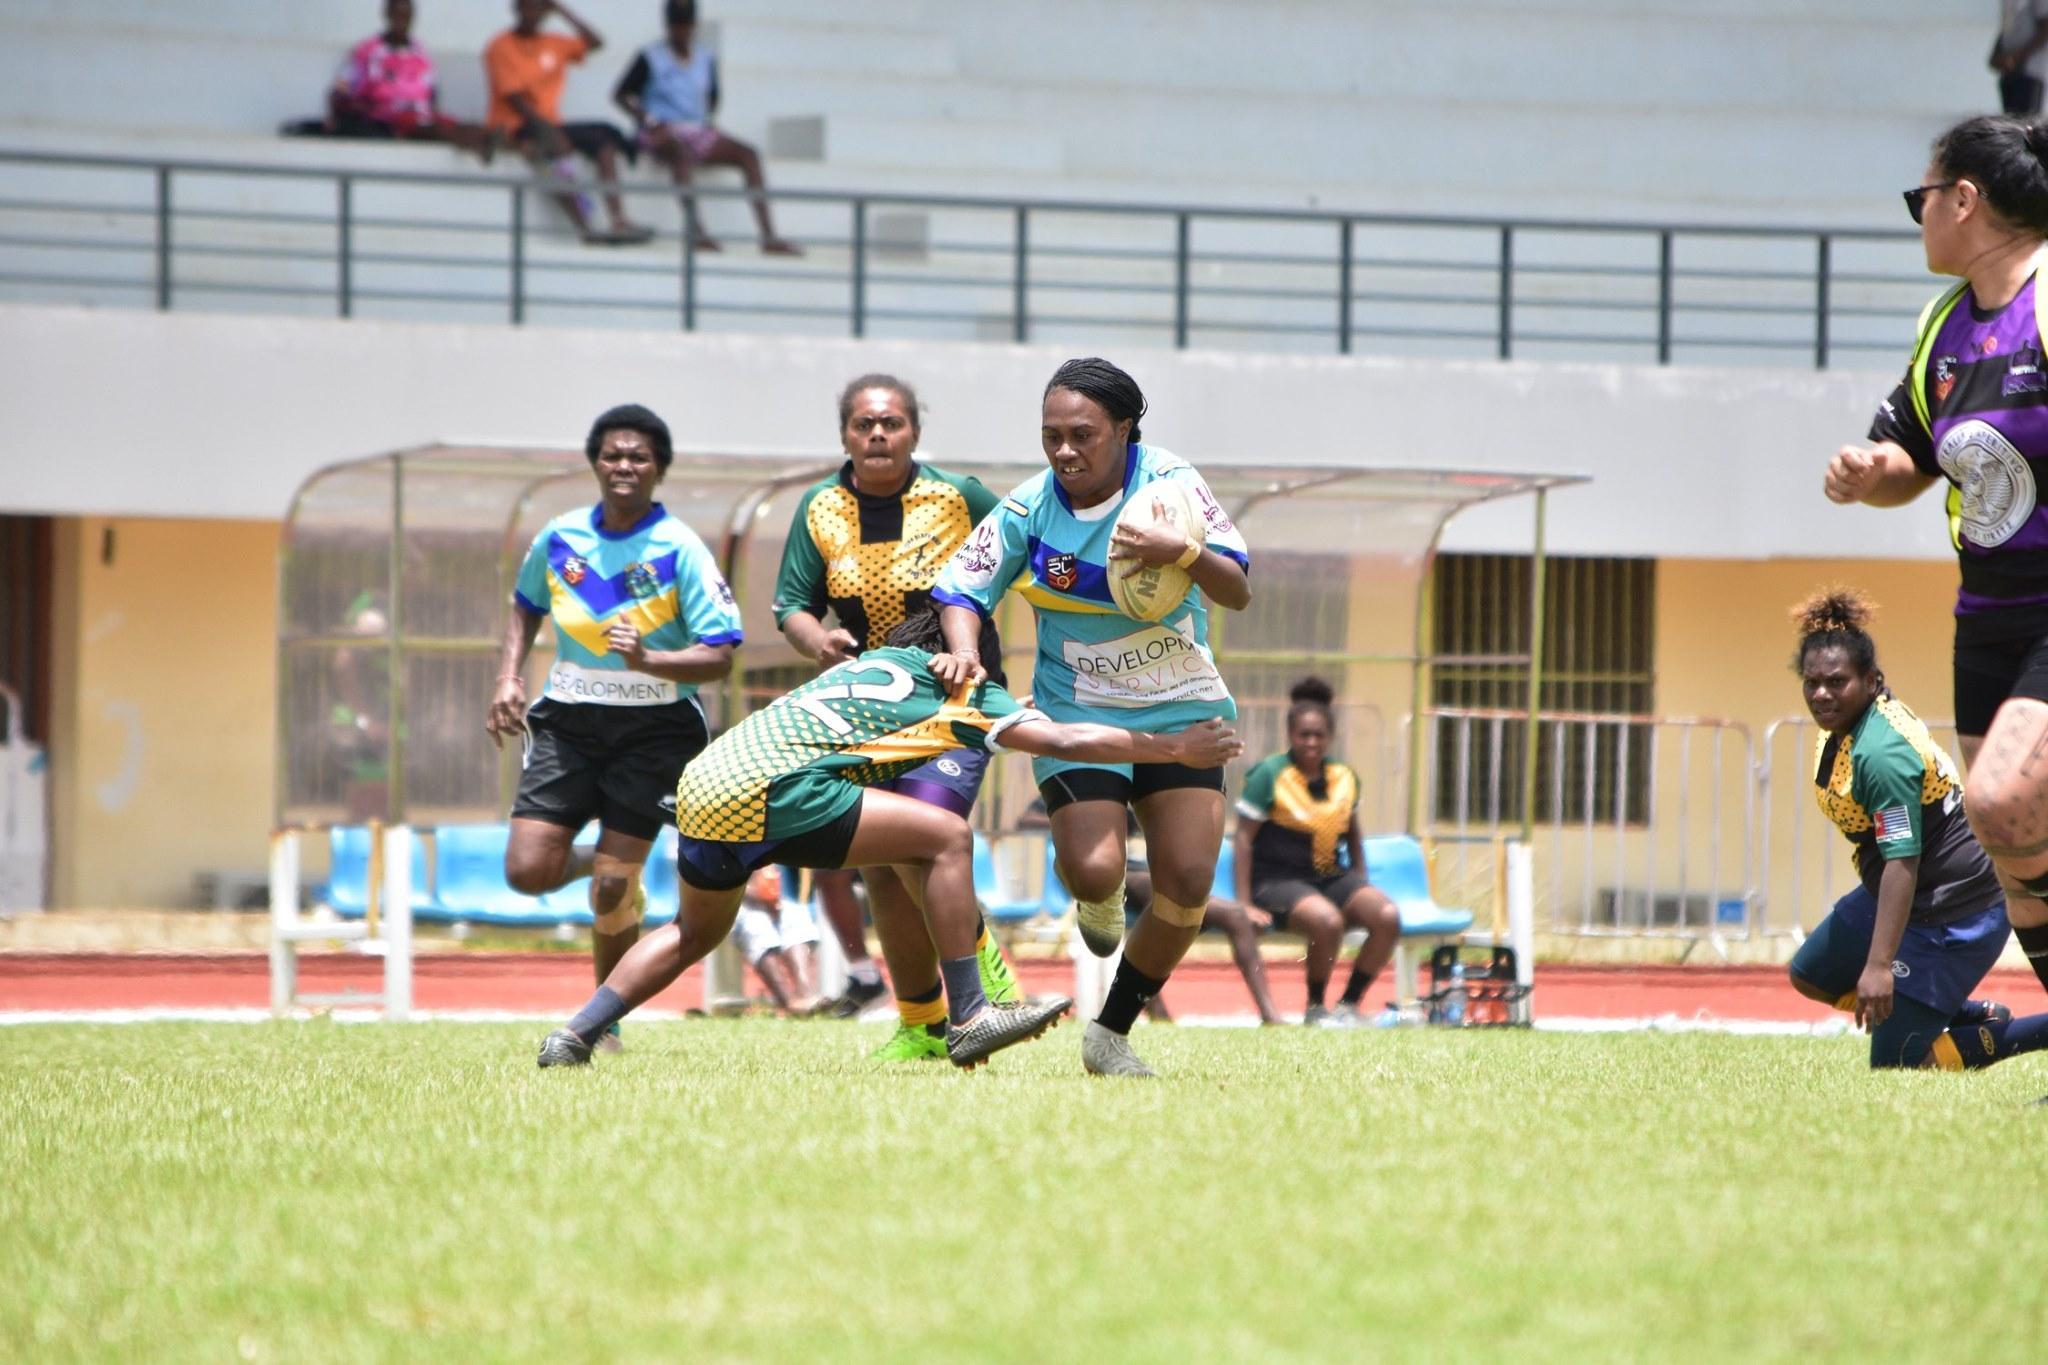 Vanuatu to host Nines tournament in November